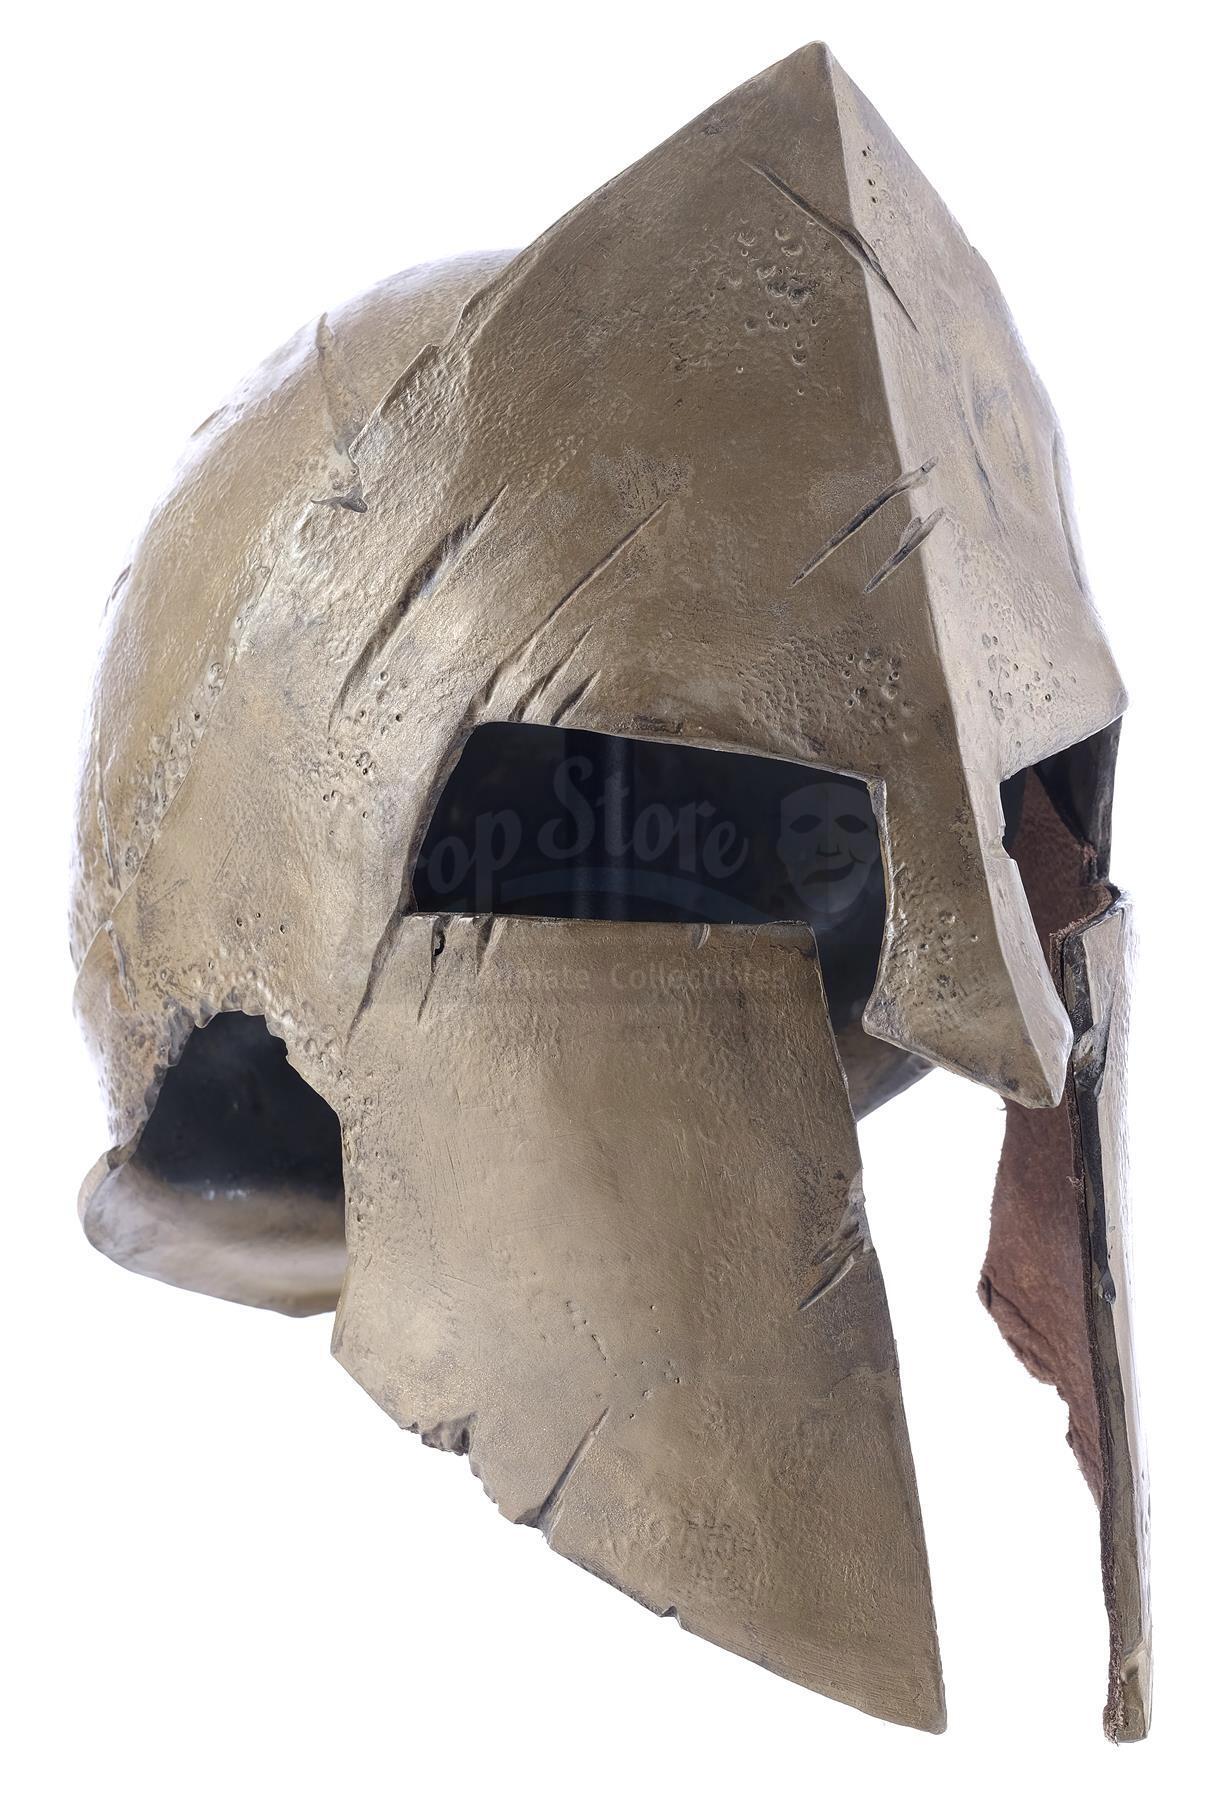 Lot # 3: 300 - Dilios' (David Wenham) Stunt Helmet